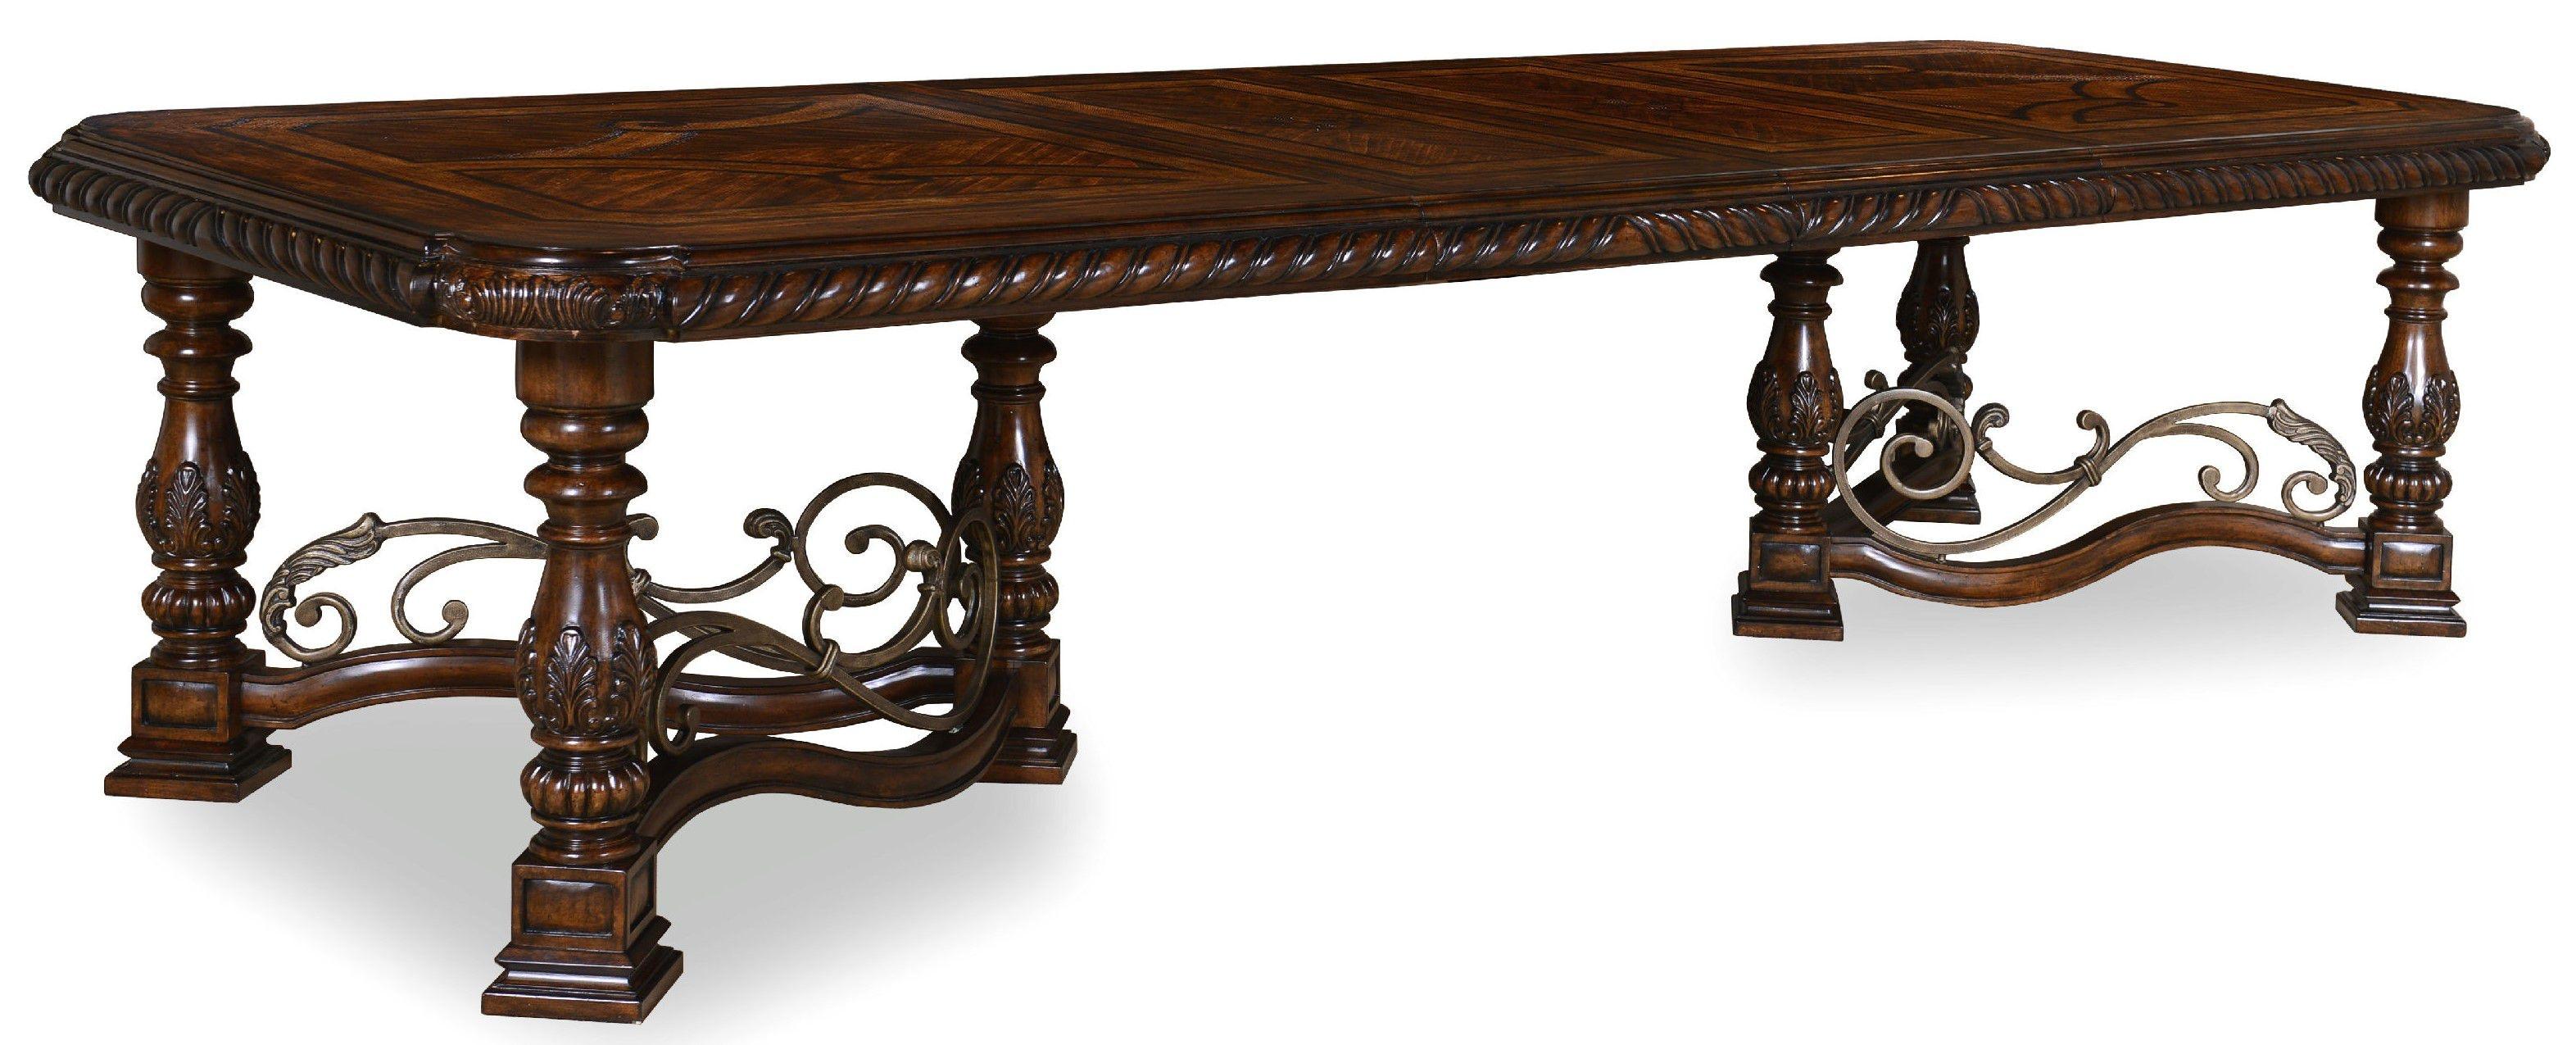 Captivating ART Furniture Dining Room Trestle Dining Table Base 209221 2304BS   Malouf  Furniture Greenwood   Greenwood, MS